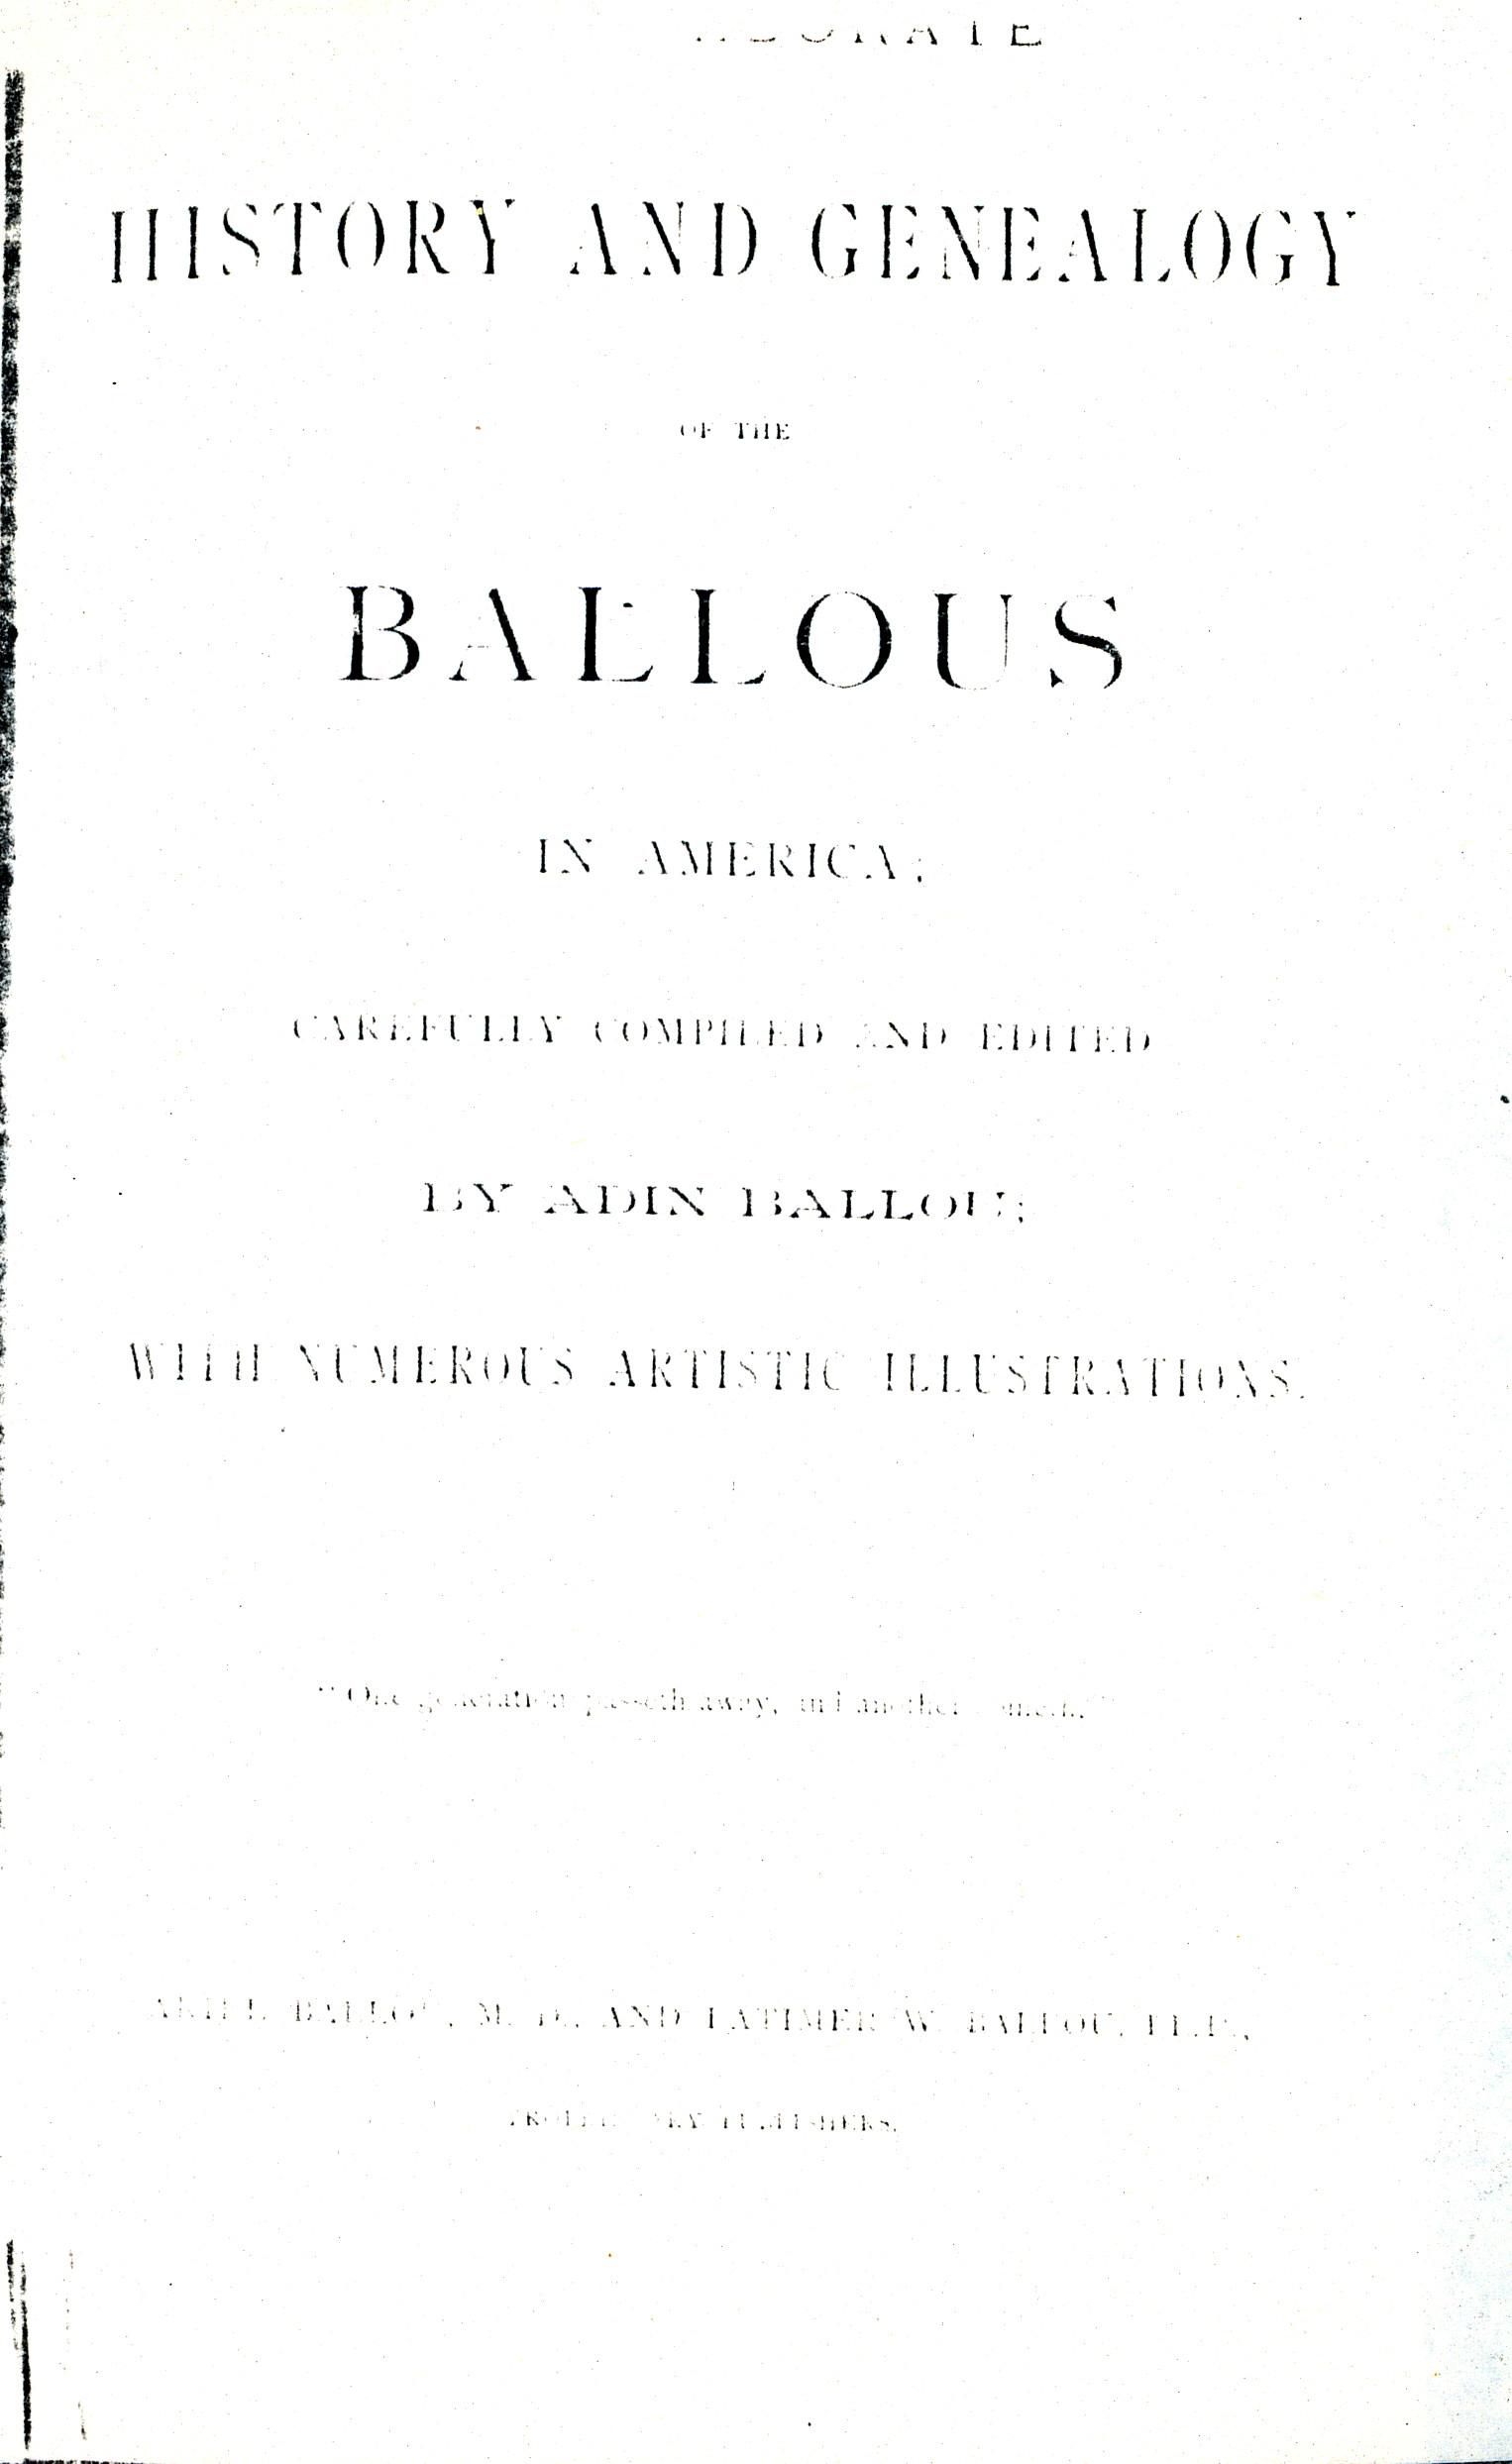 Lydia Ballou